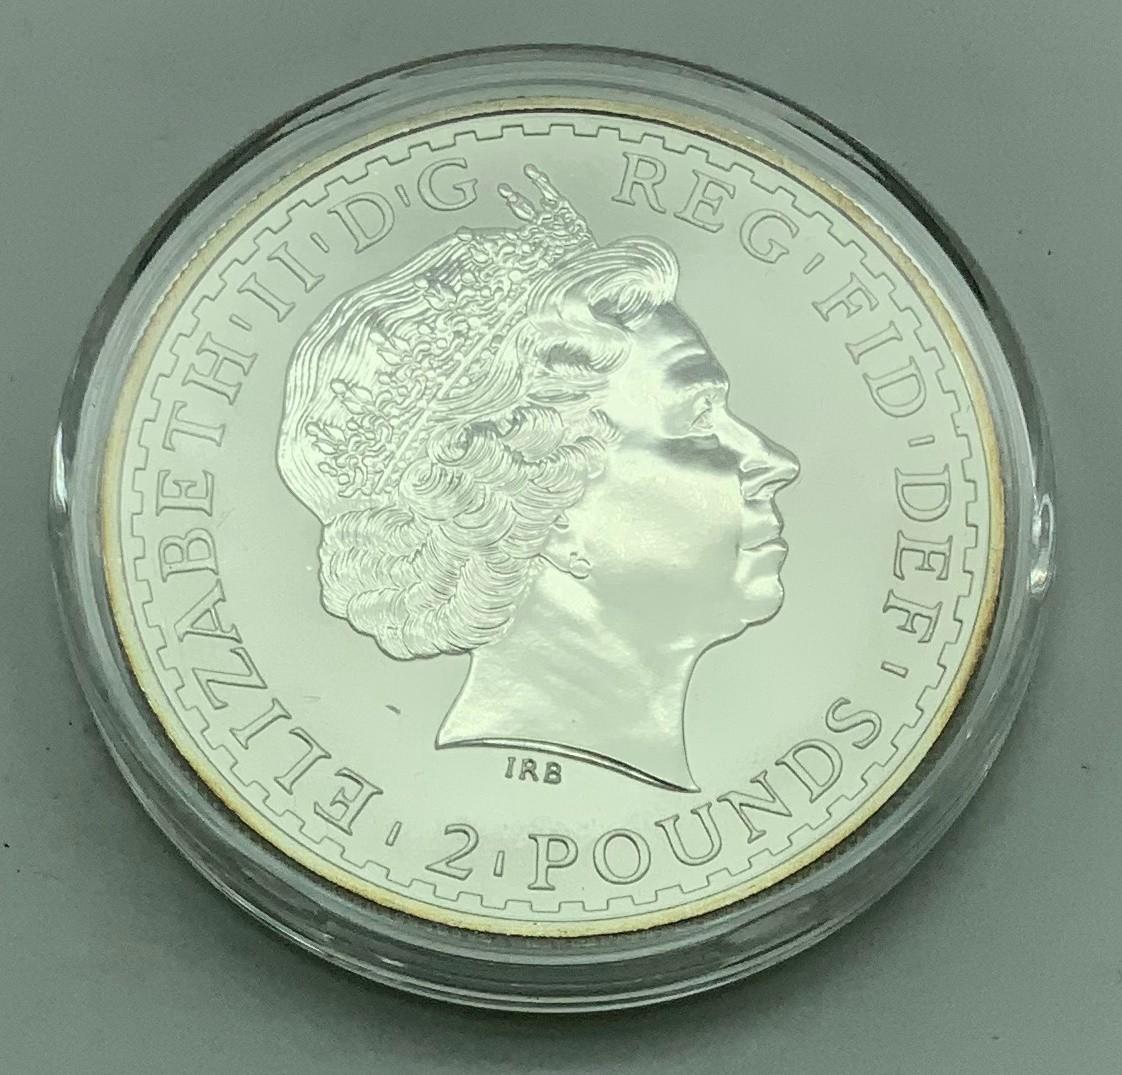 2004 BRITANNIA TWO POUNDS ONE-OUNCE SILVER COIN